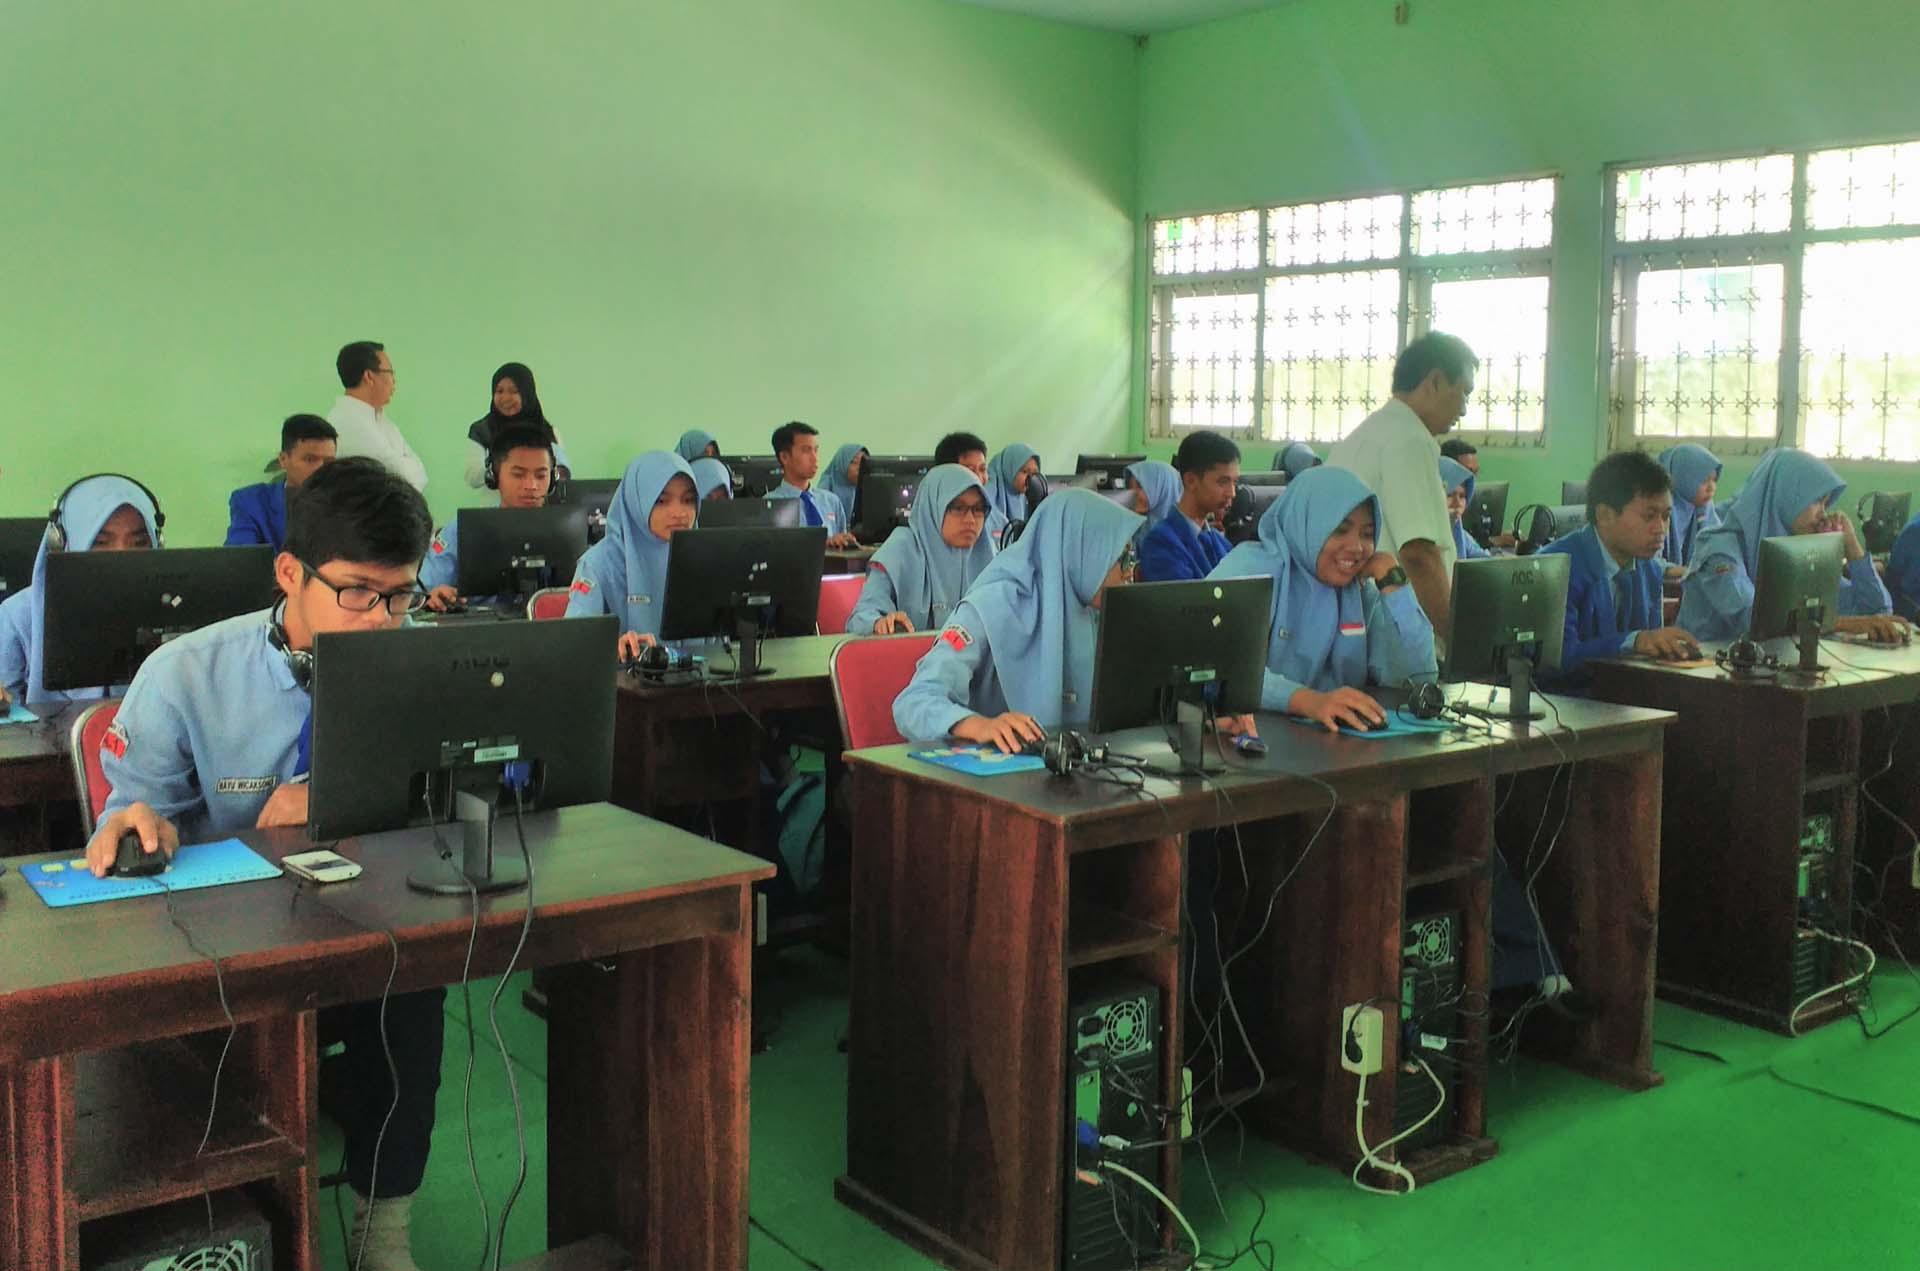 Pelaksanaan Ujian Nasional Berbasis Komputer Sman 1 Srengat